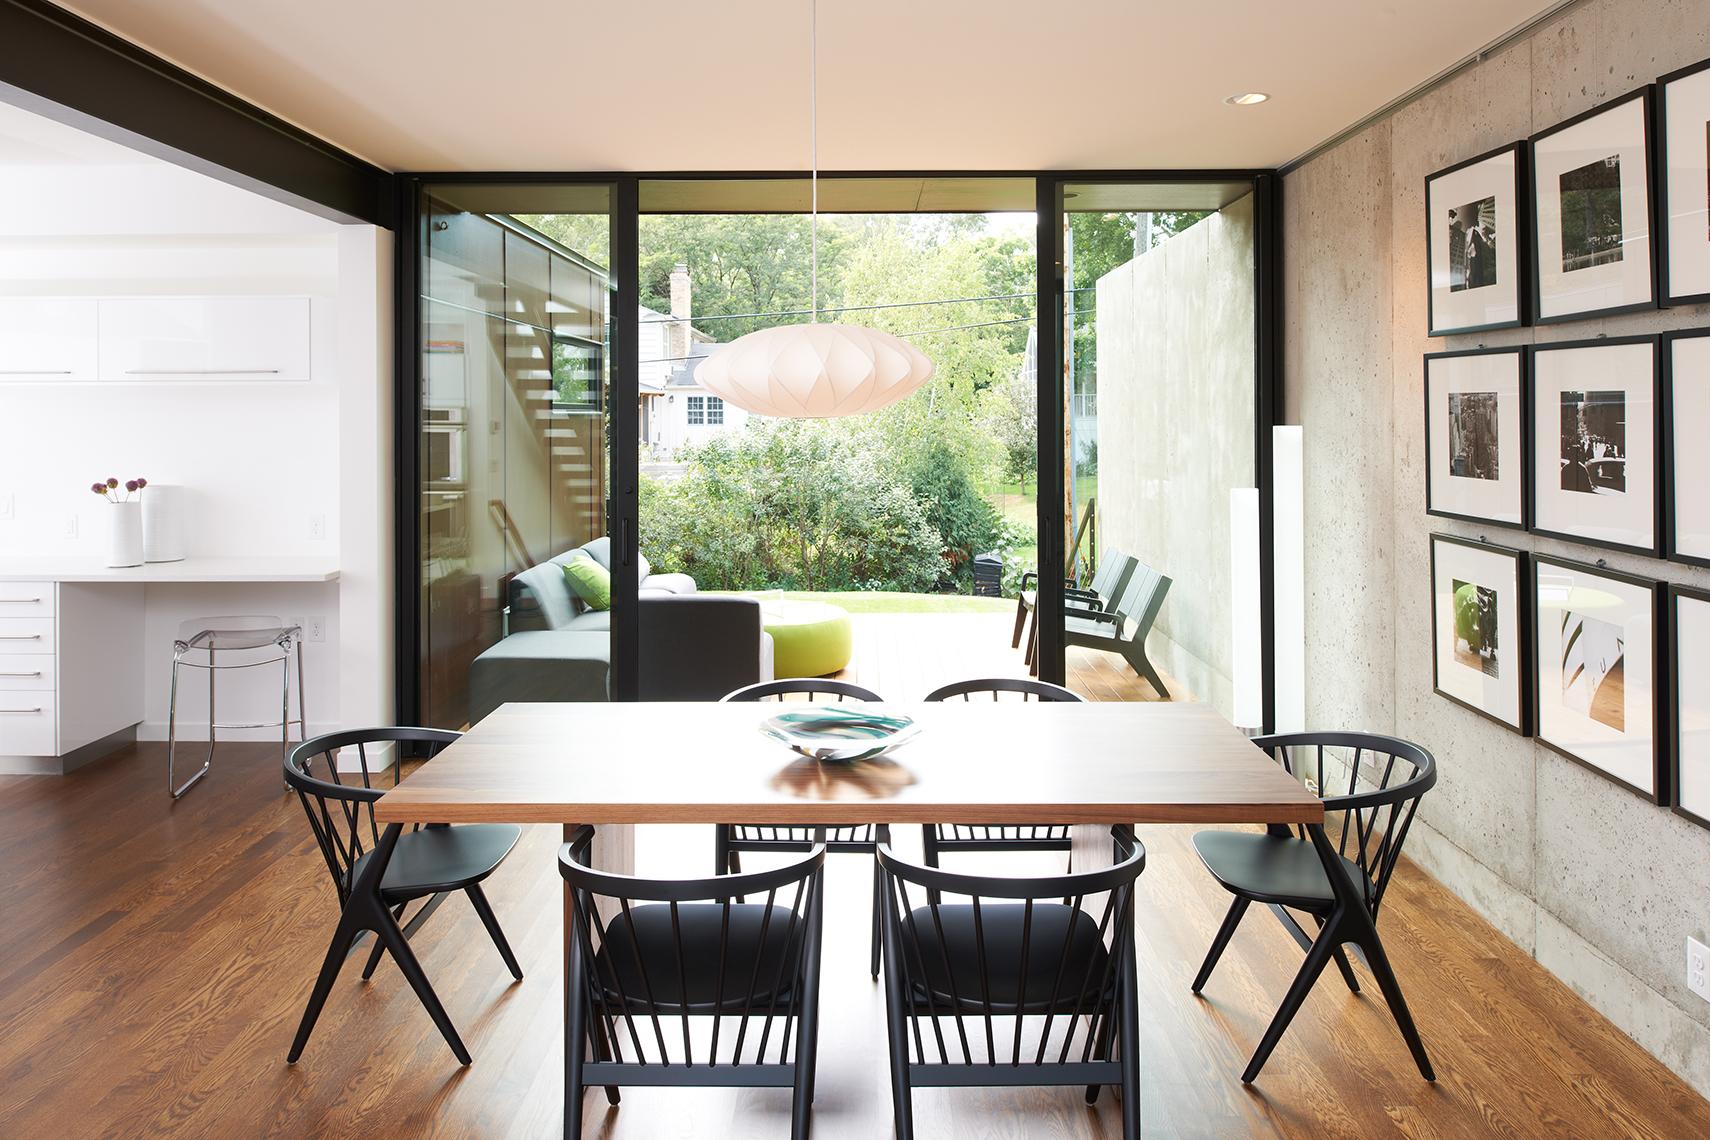 Modern dining room overlooking yard through full-height sliding glass door